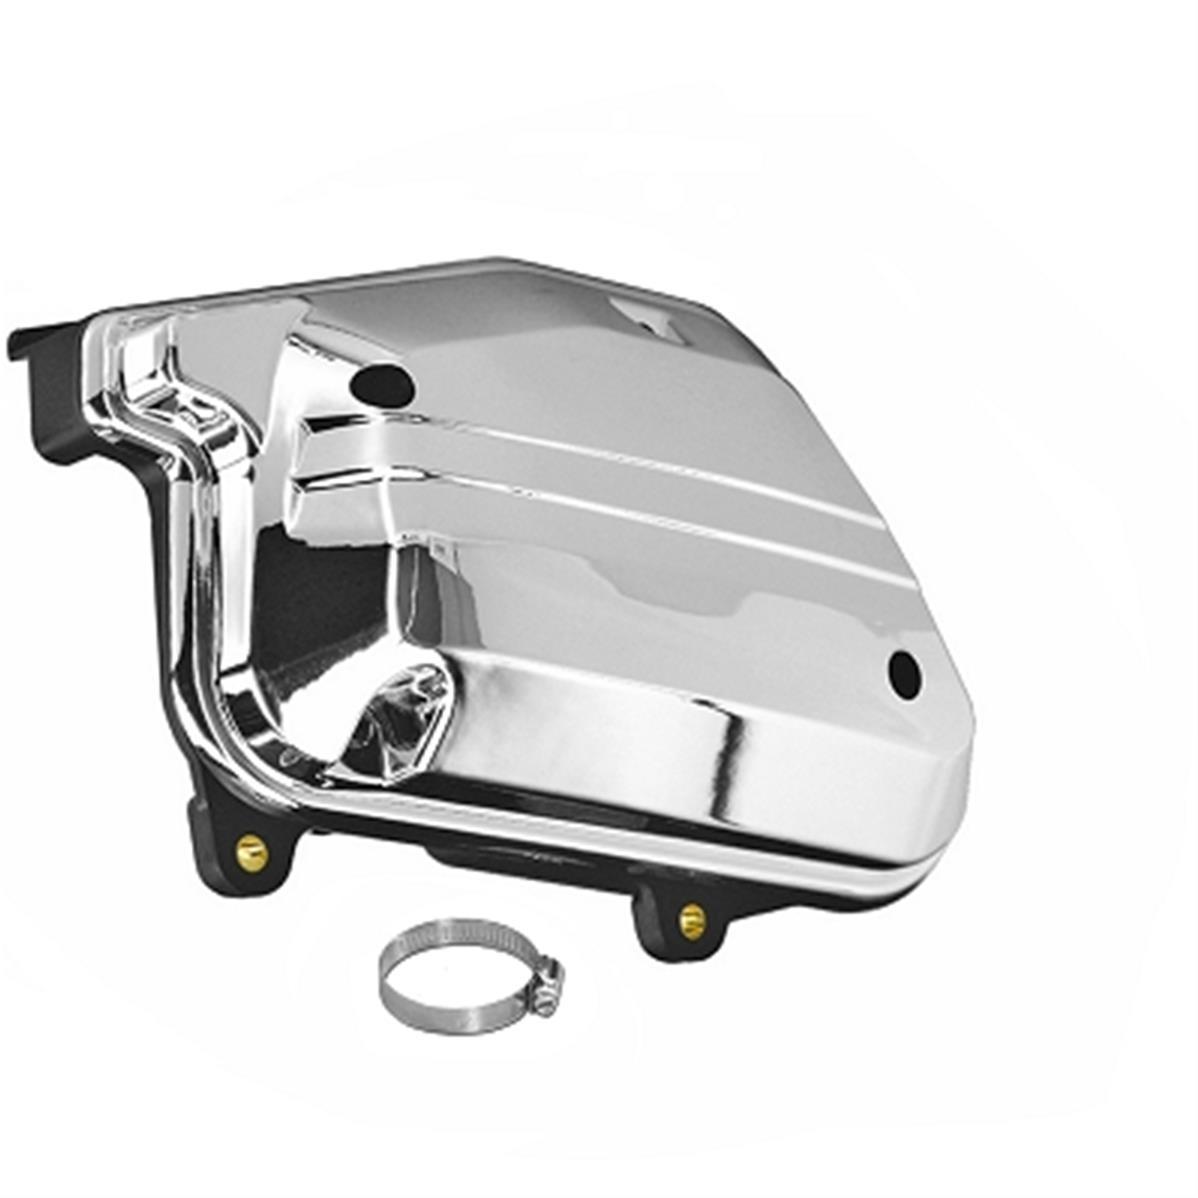 Boite à air type origine Bihr MBK Booster / Yamaha Bws